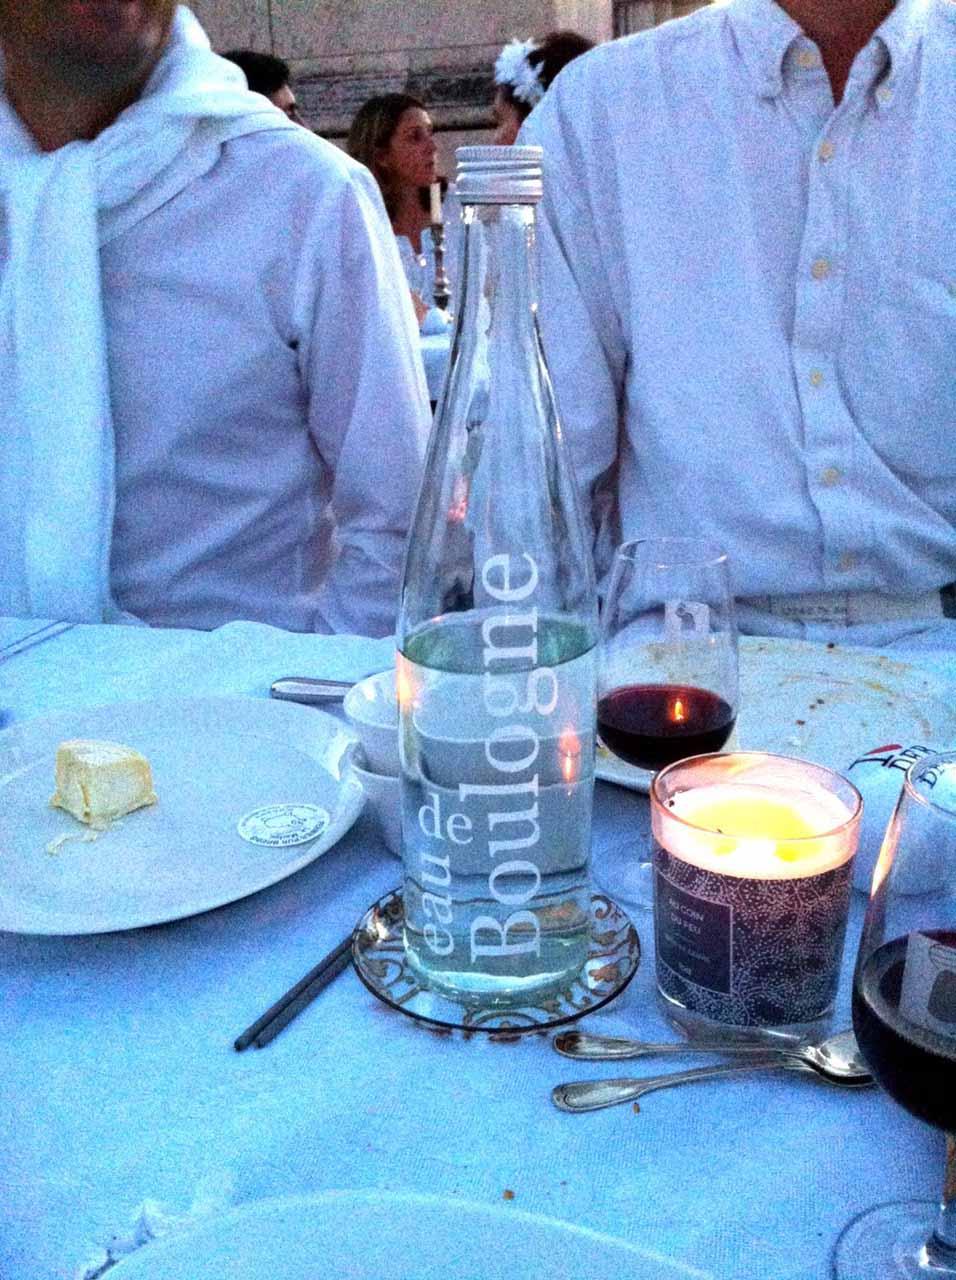 dîner_en_blanc